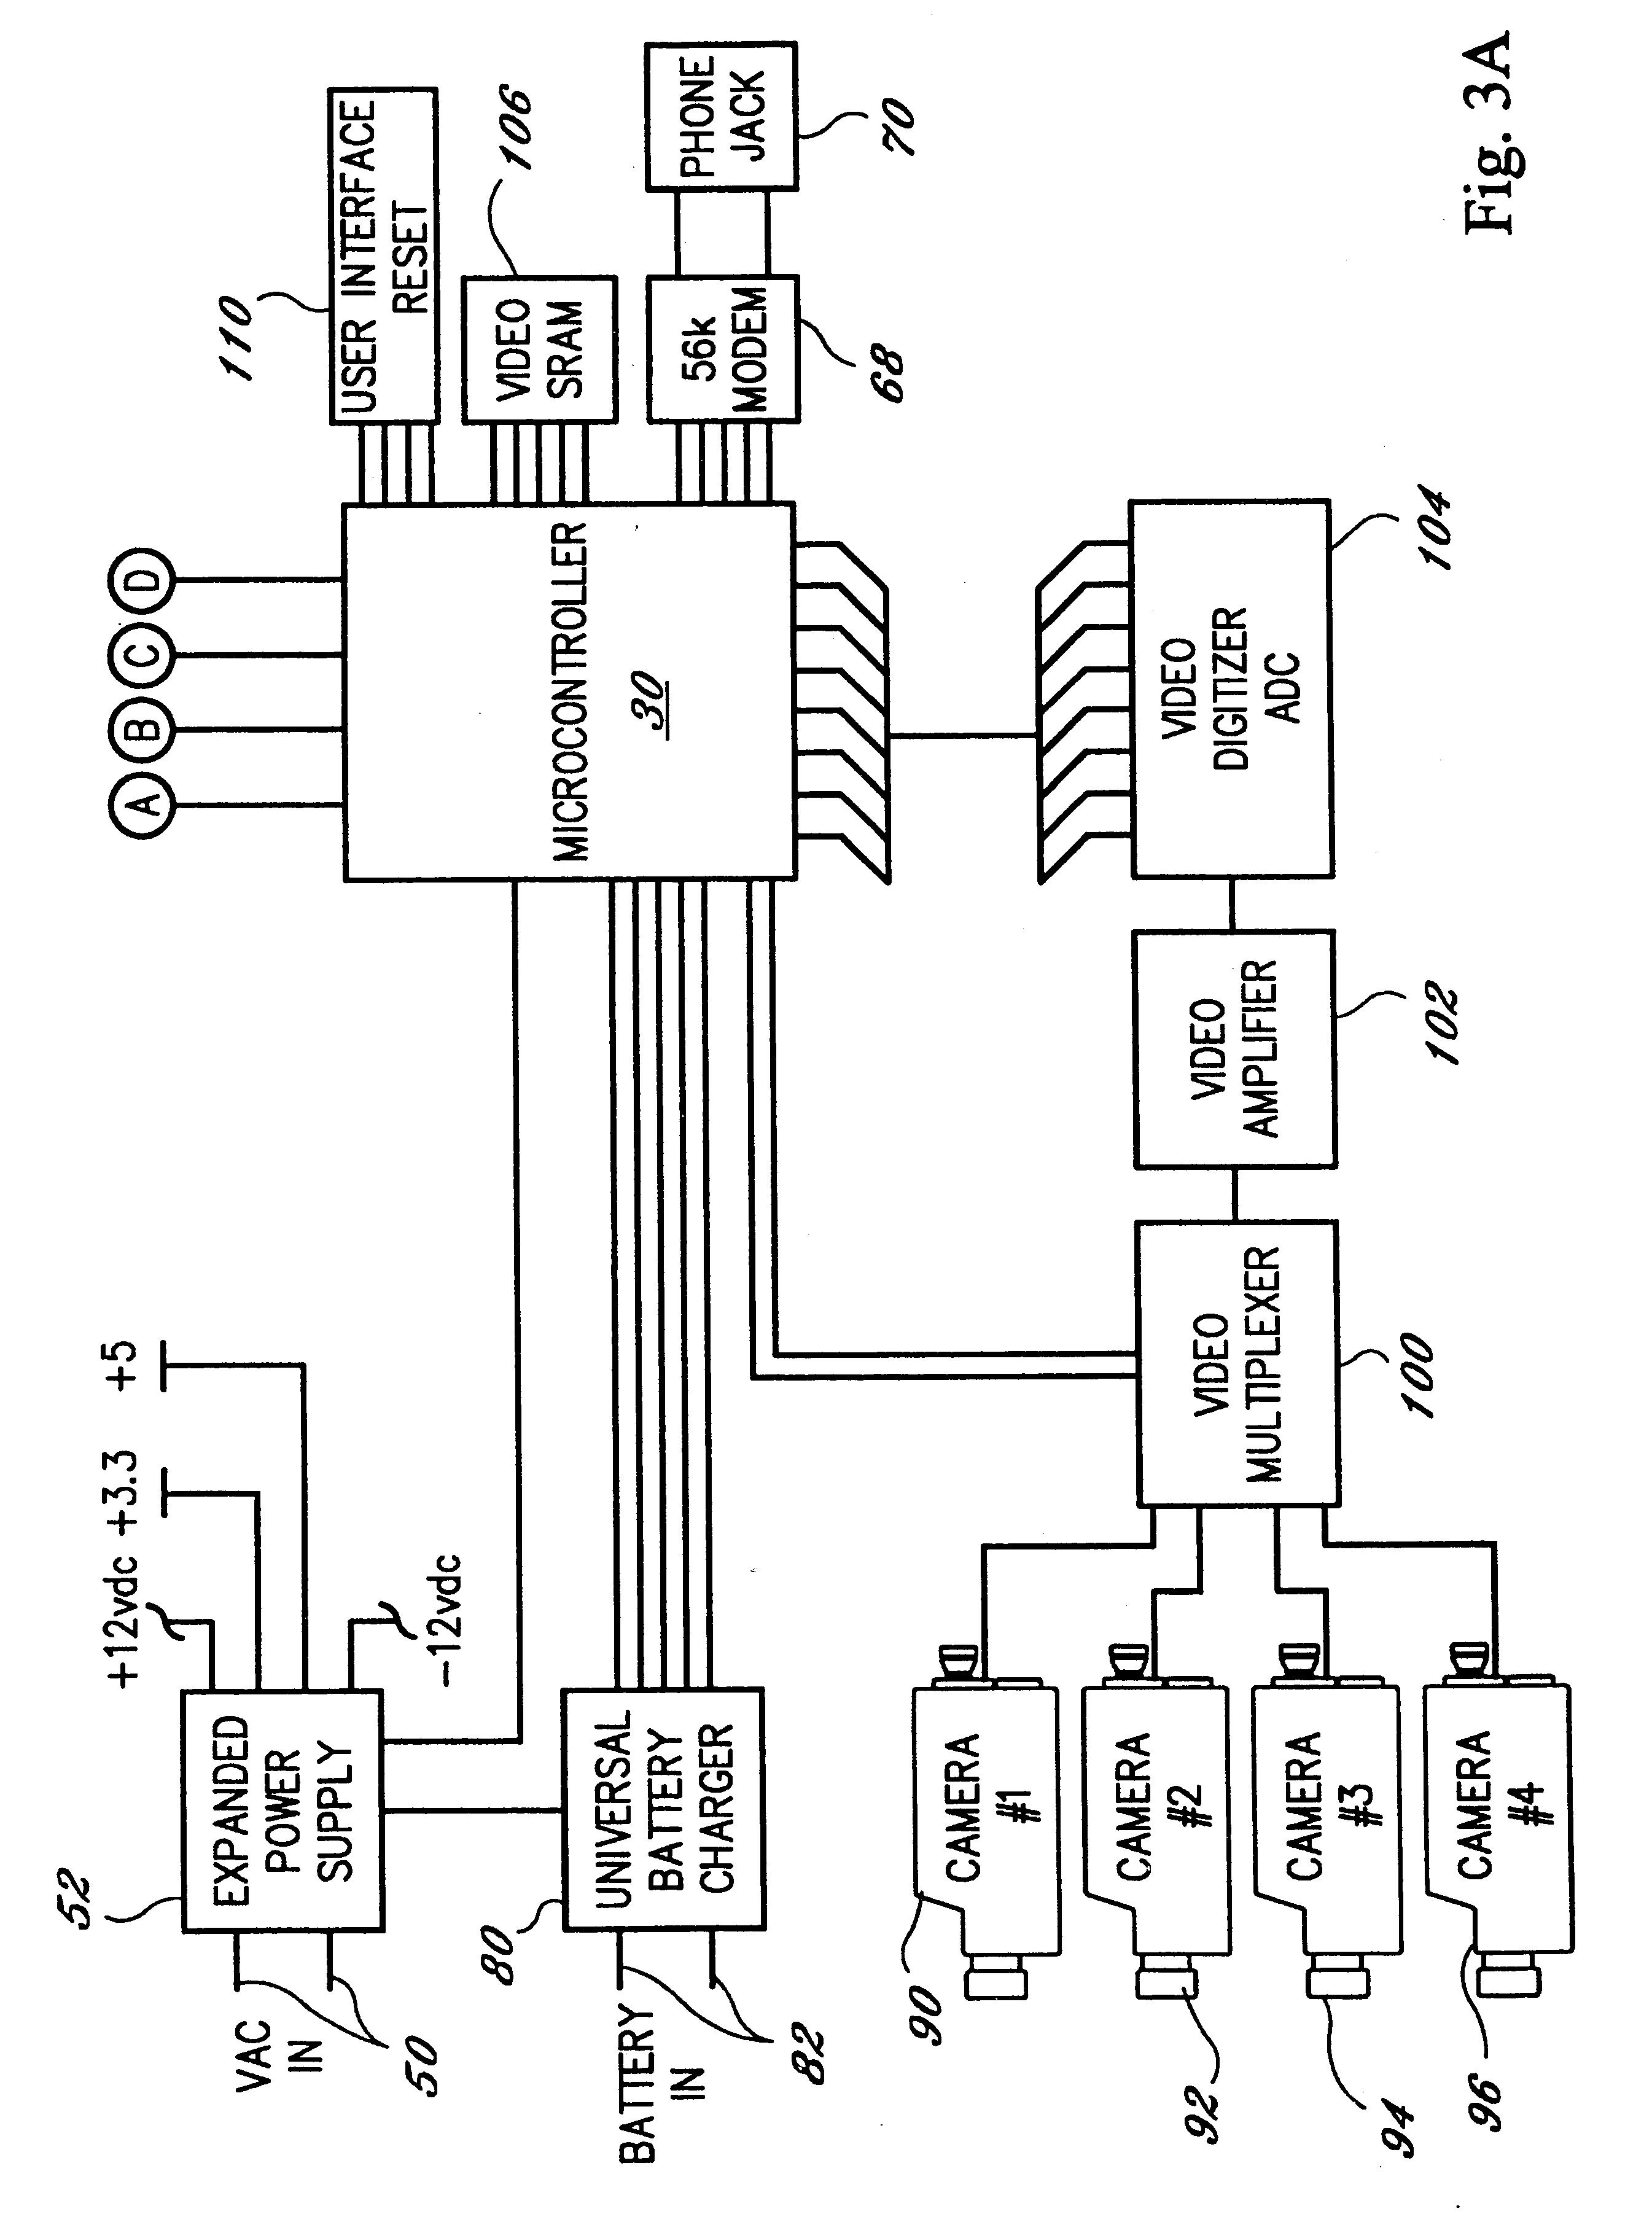 brevet us6766835 - tank monitor system